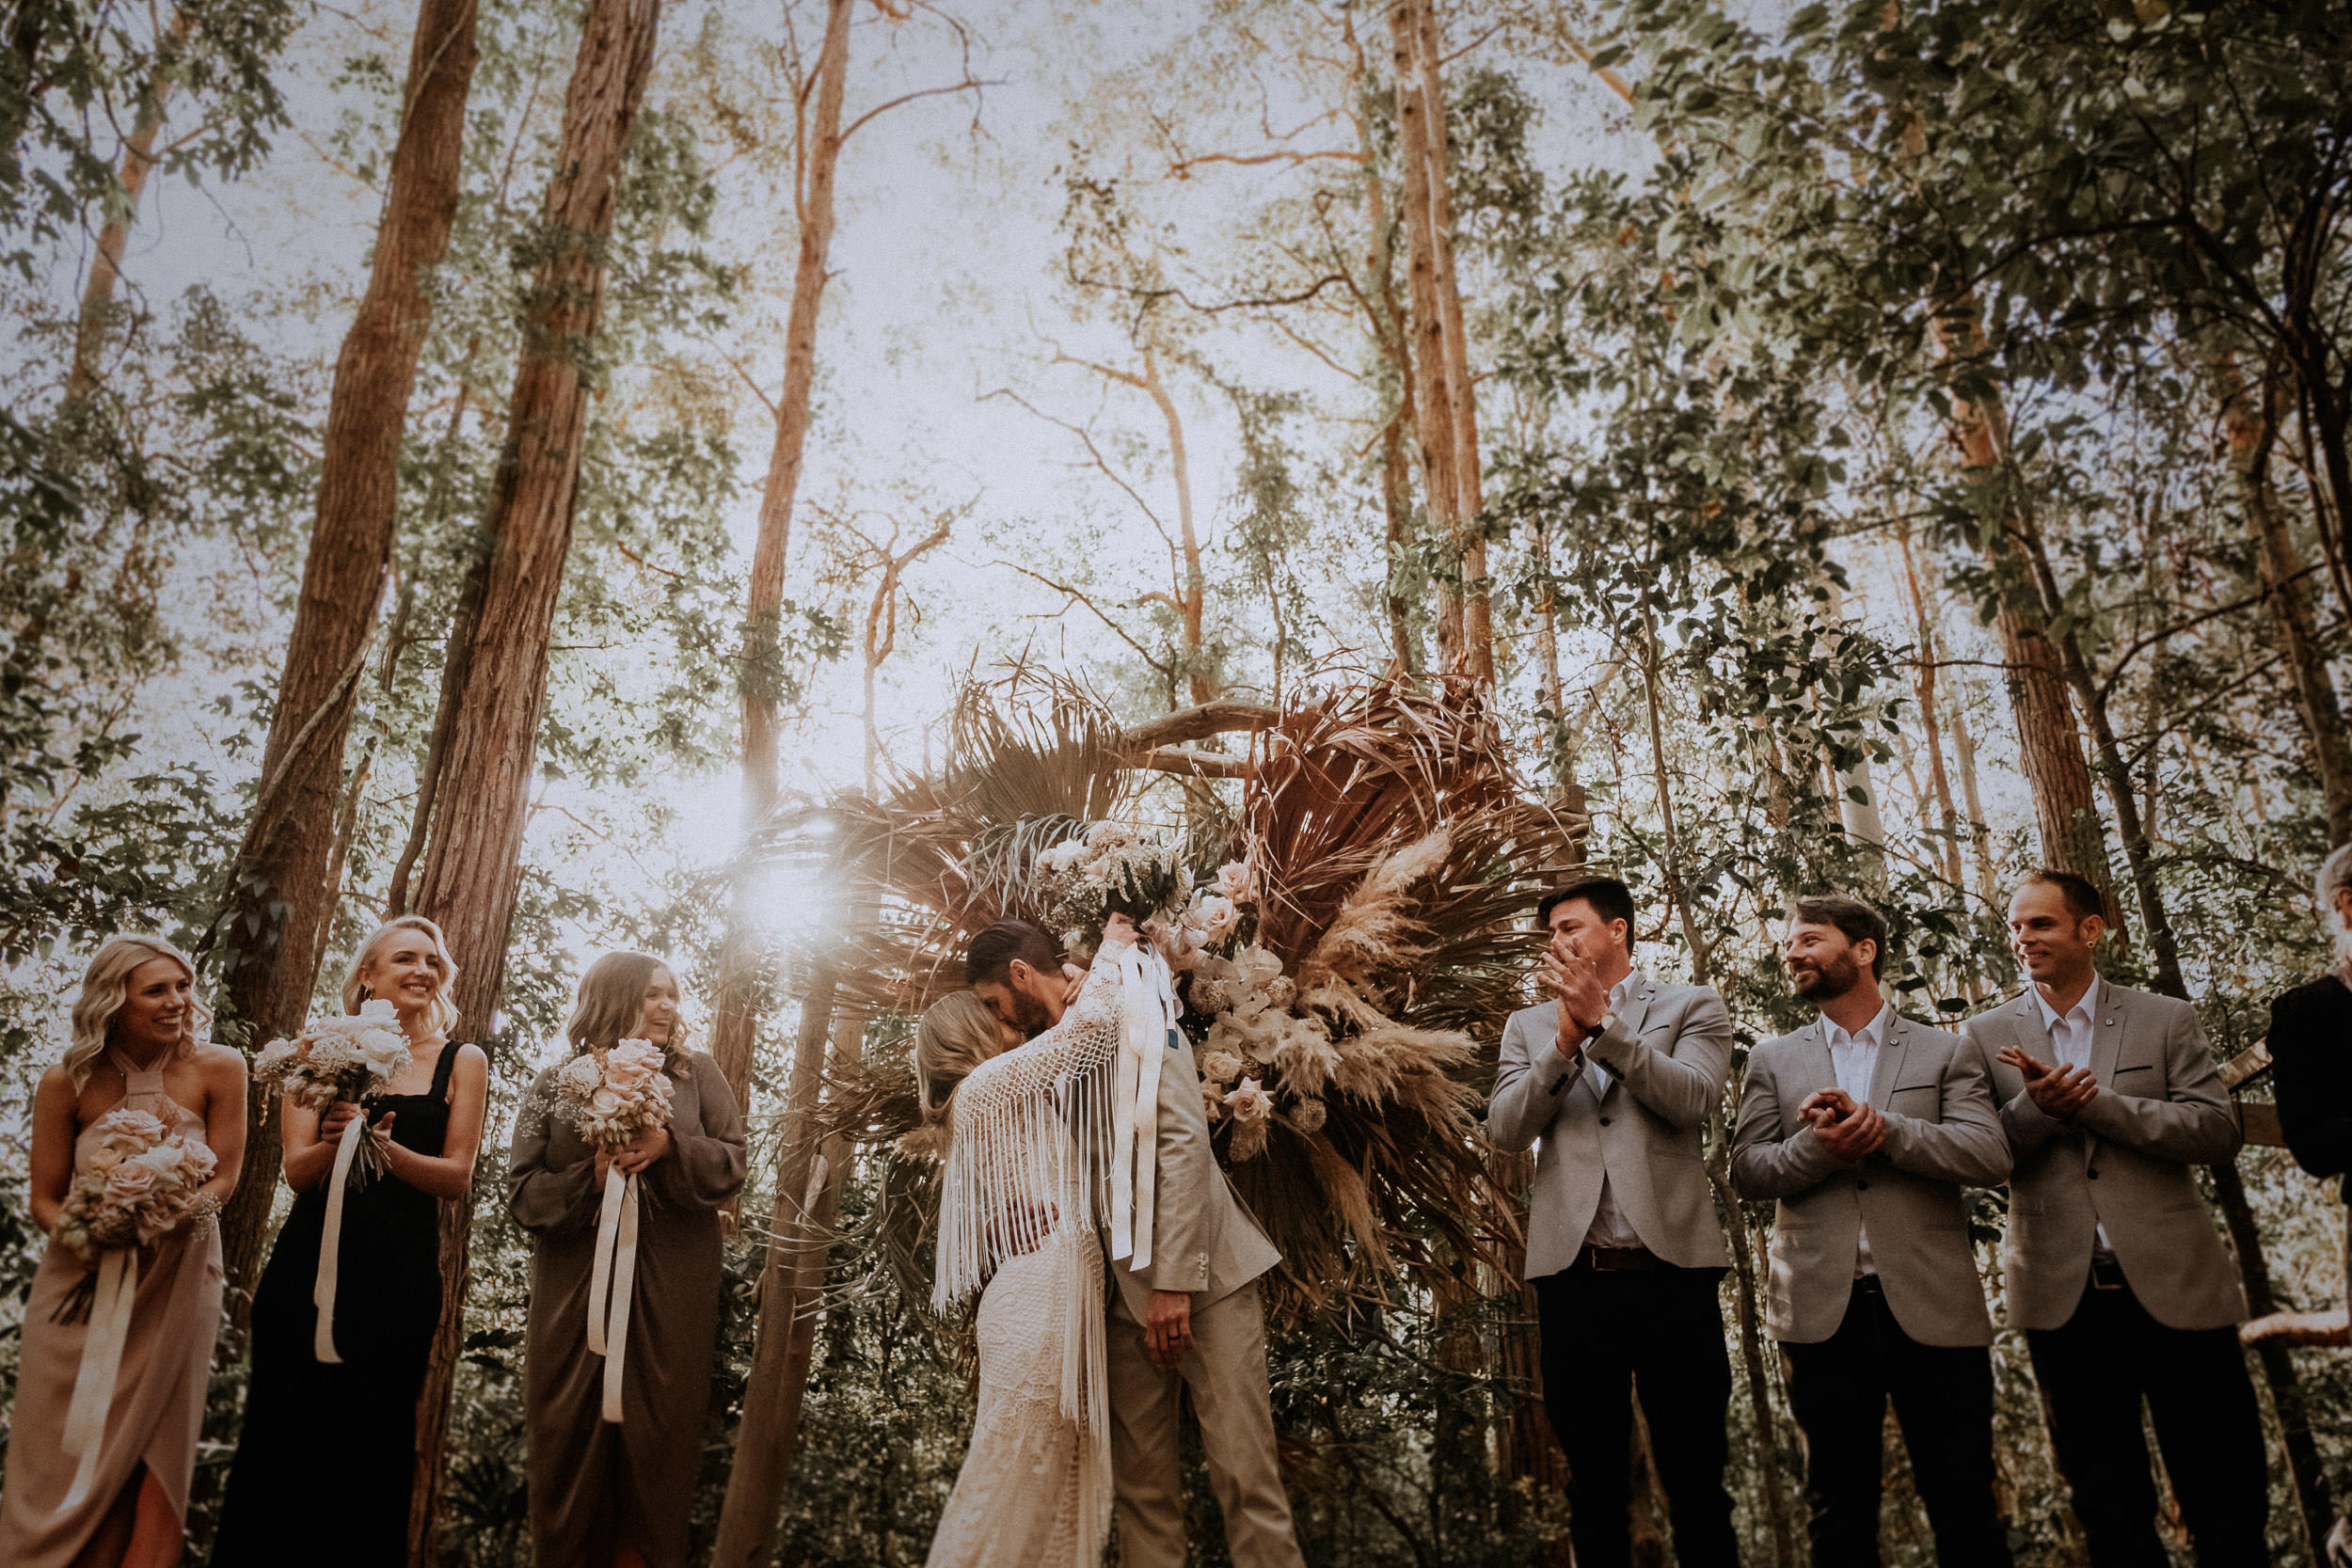 S&A Elopement - Kings & Thieves - Shred 'Til Dead - Central Coast Beach Forest Wedding - 264.jpg